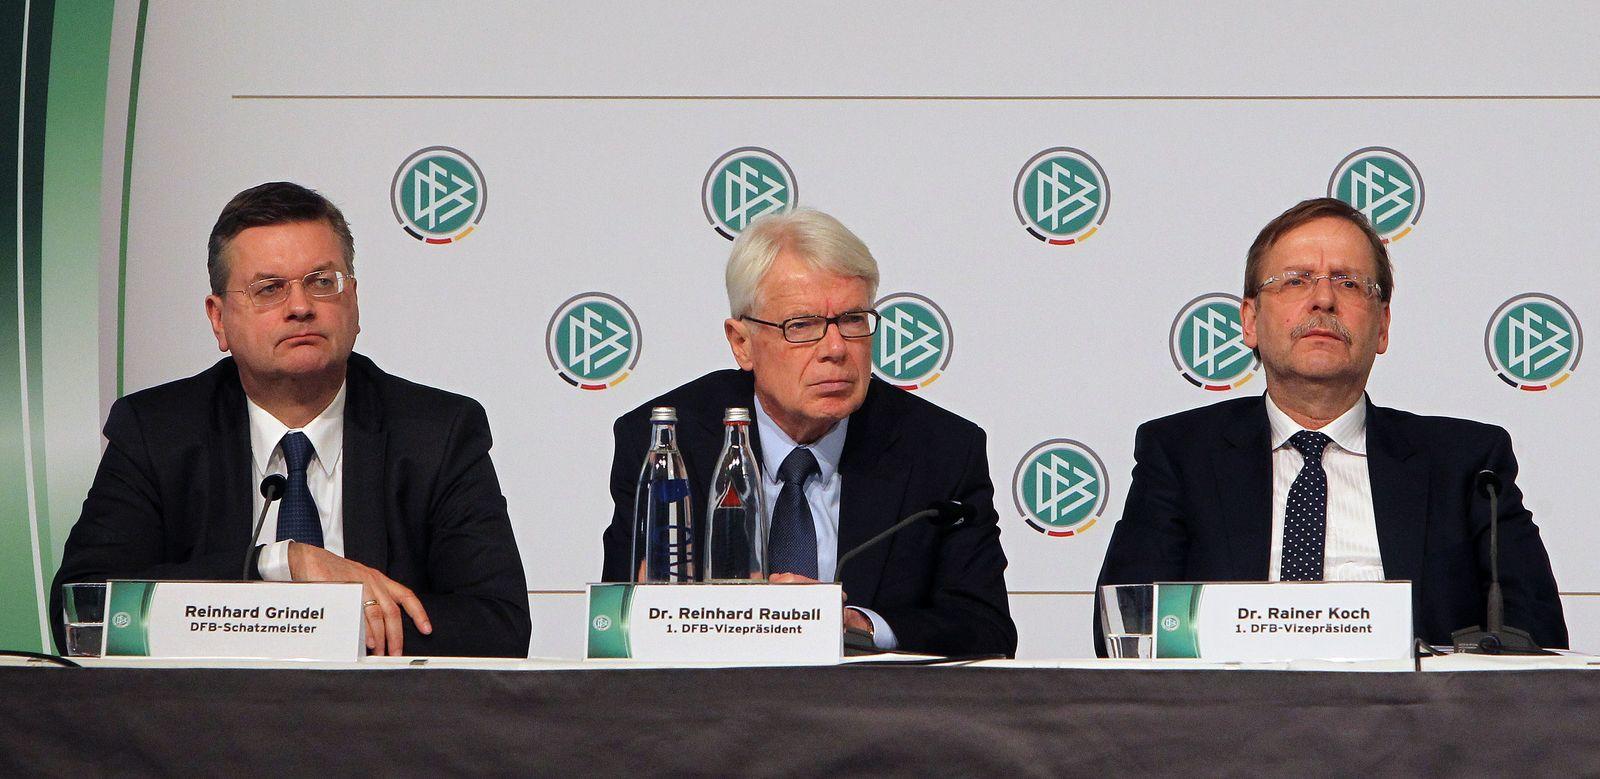 FBL-GER-FIFA-DFB-CORRUPTION